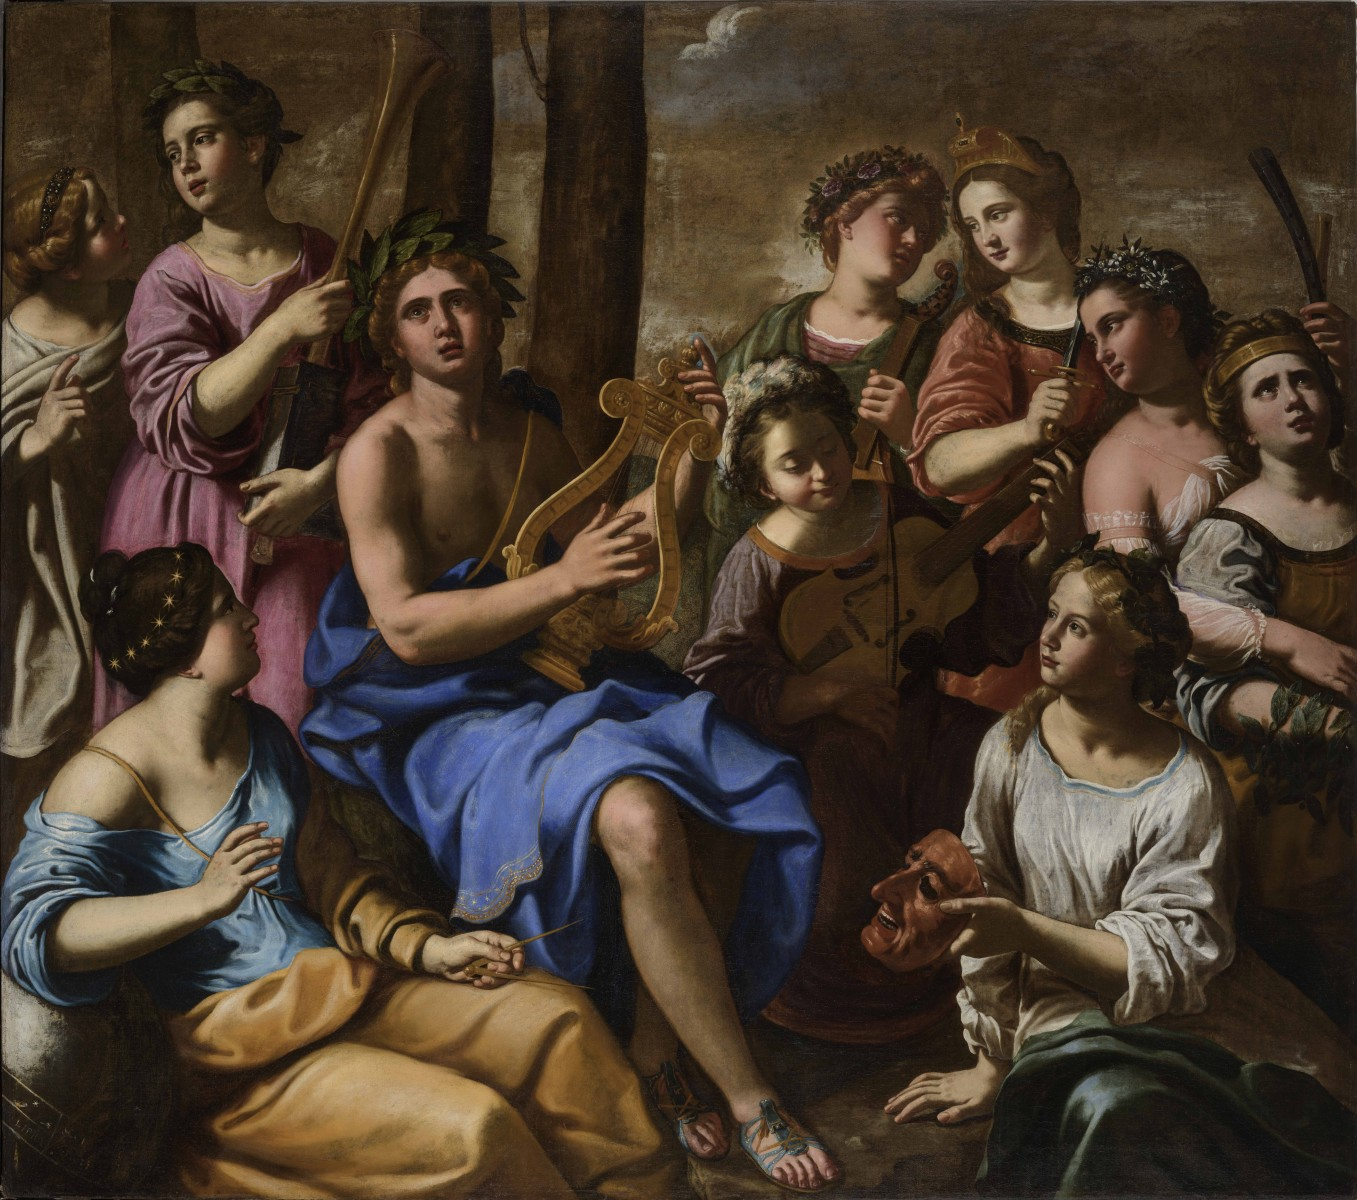 <p><b>Antiveduto Gramatica</b></p><p>Roma?, 1570 circa – Roma, 1626</p><p><i>Apollo and the Muses</i></p><p>circa 1520-1525</p><p>Oil on canvas, cm 152 x 172</p>